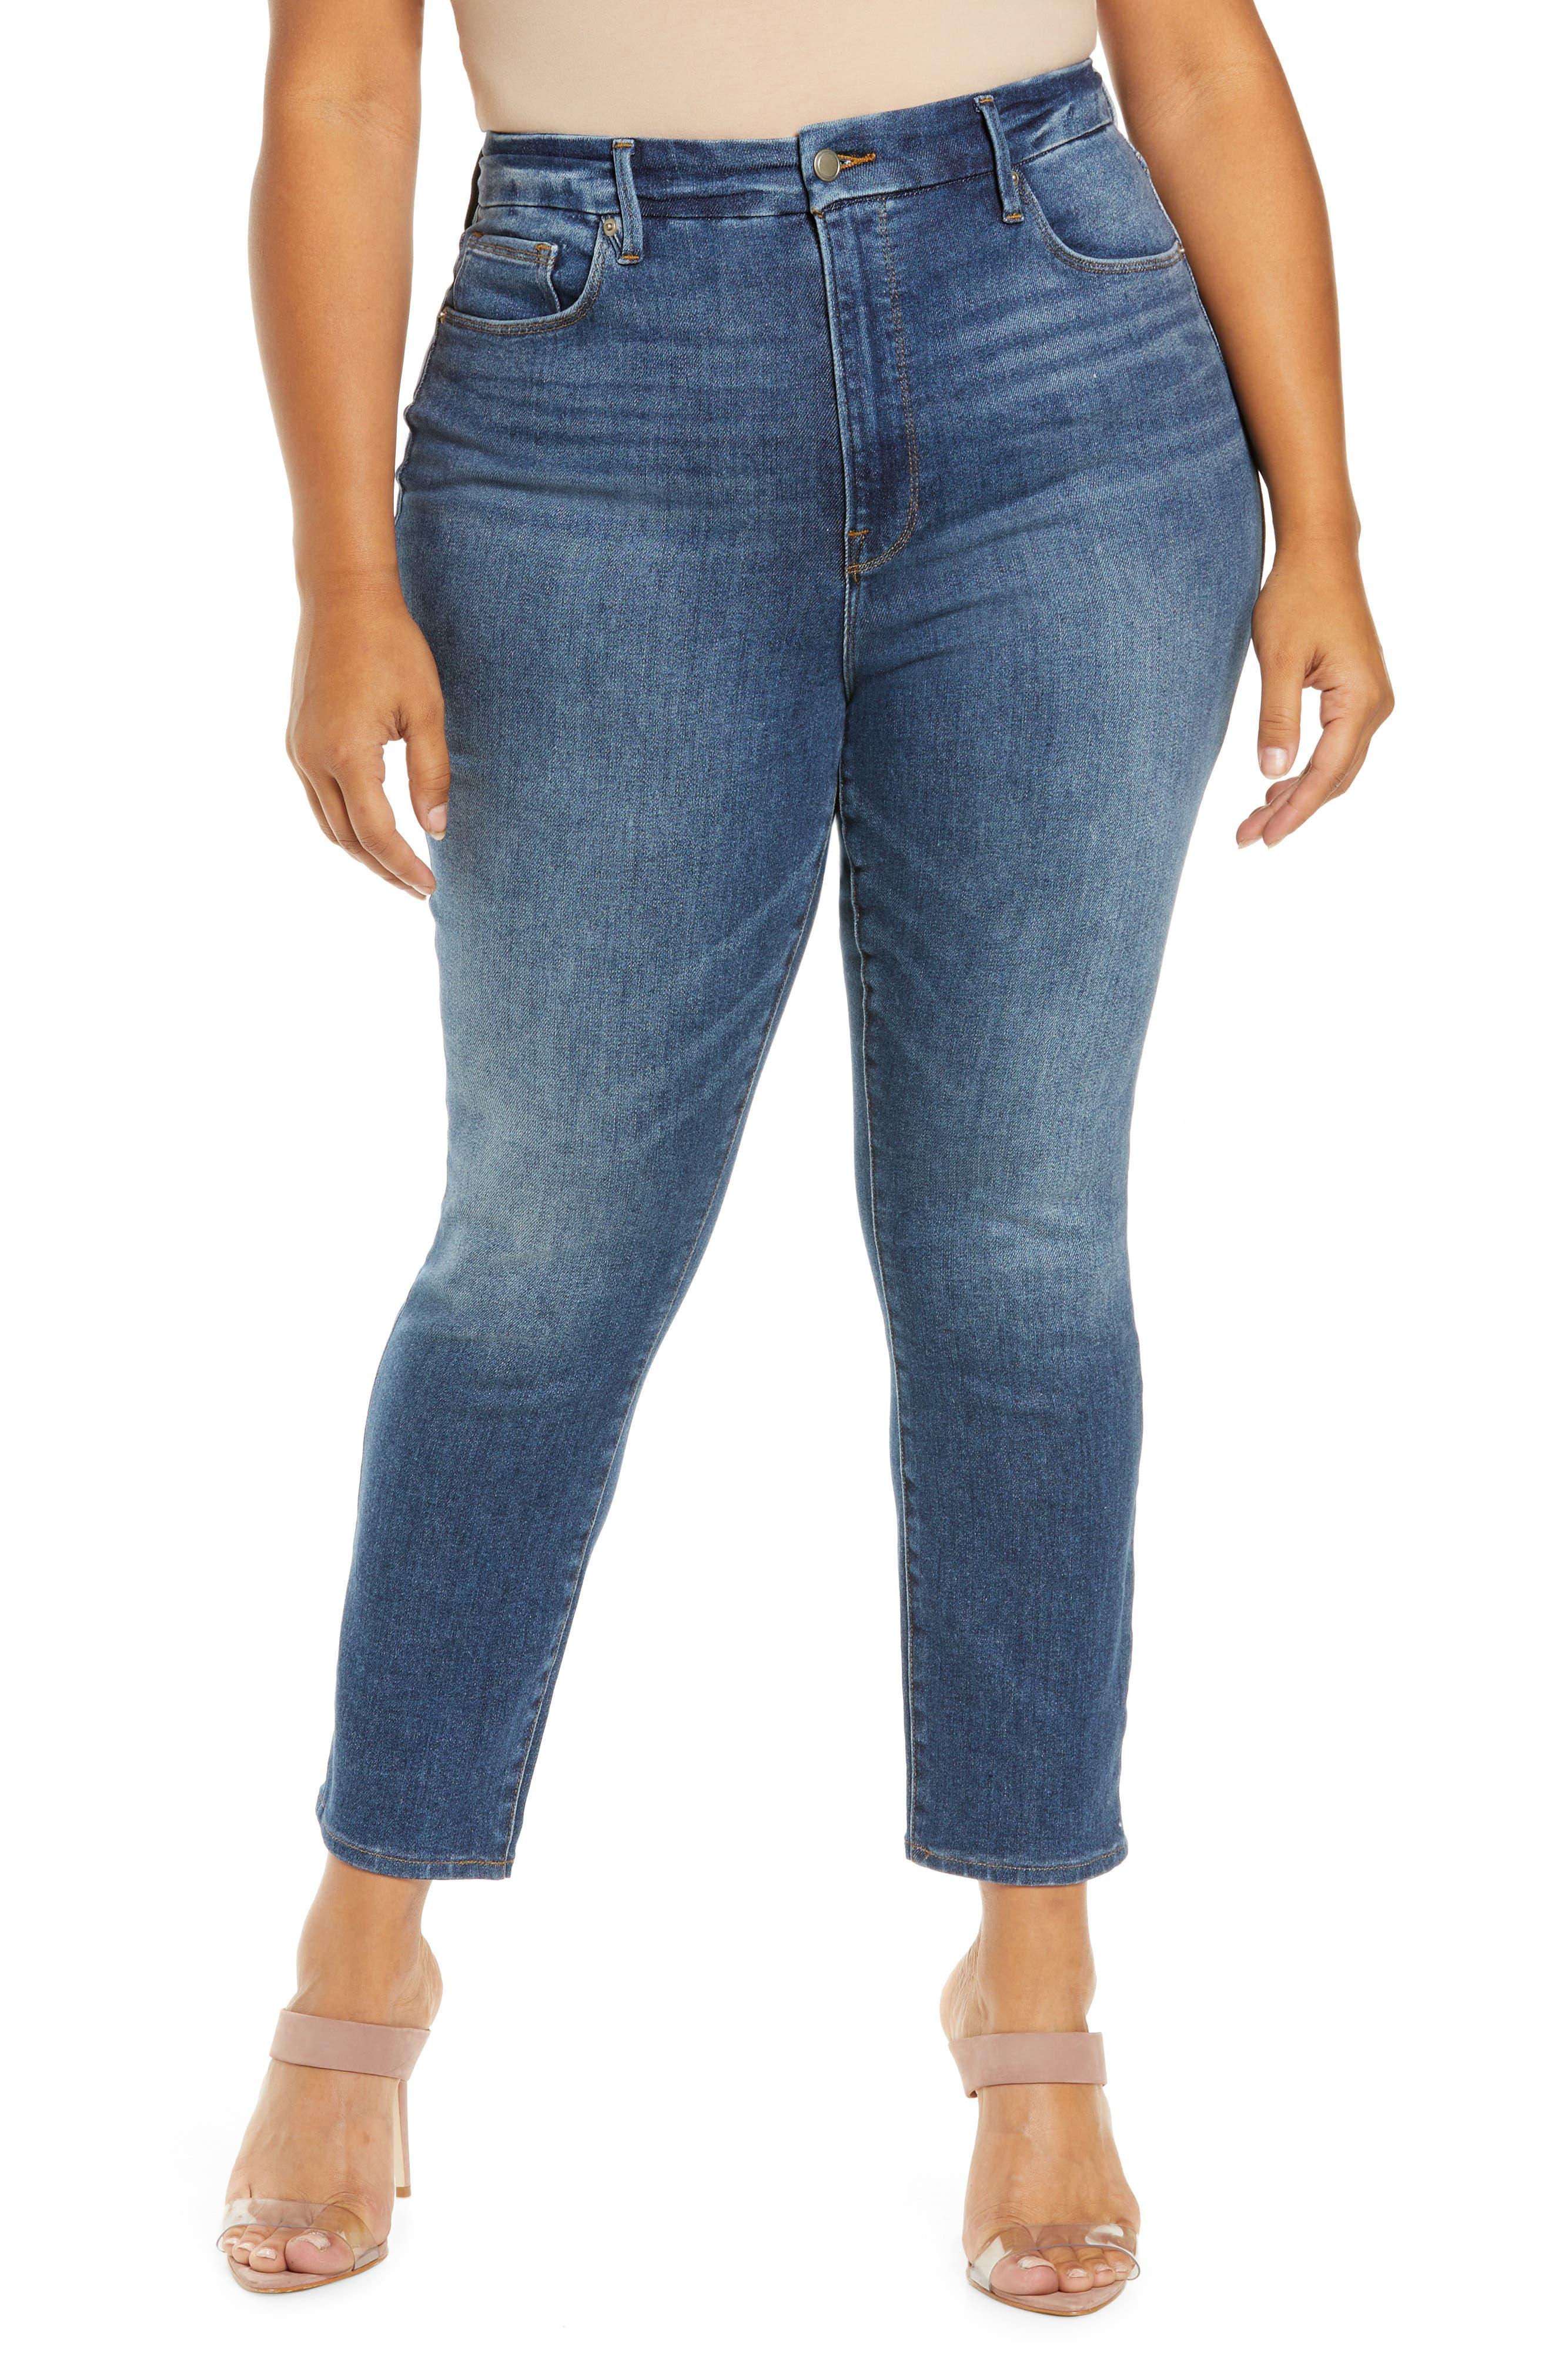 Women's Good American Good Leg Ankle Skinny Jeans